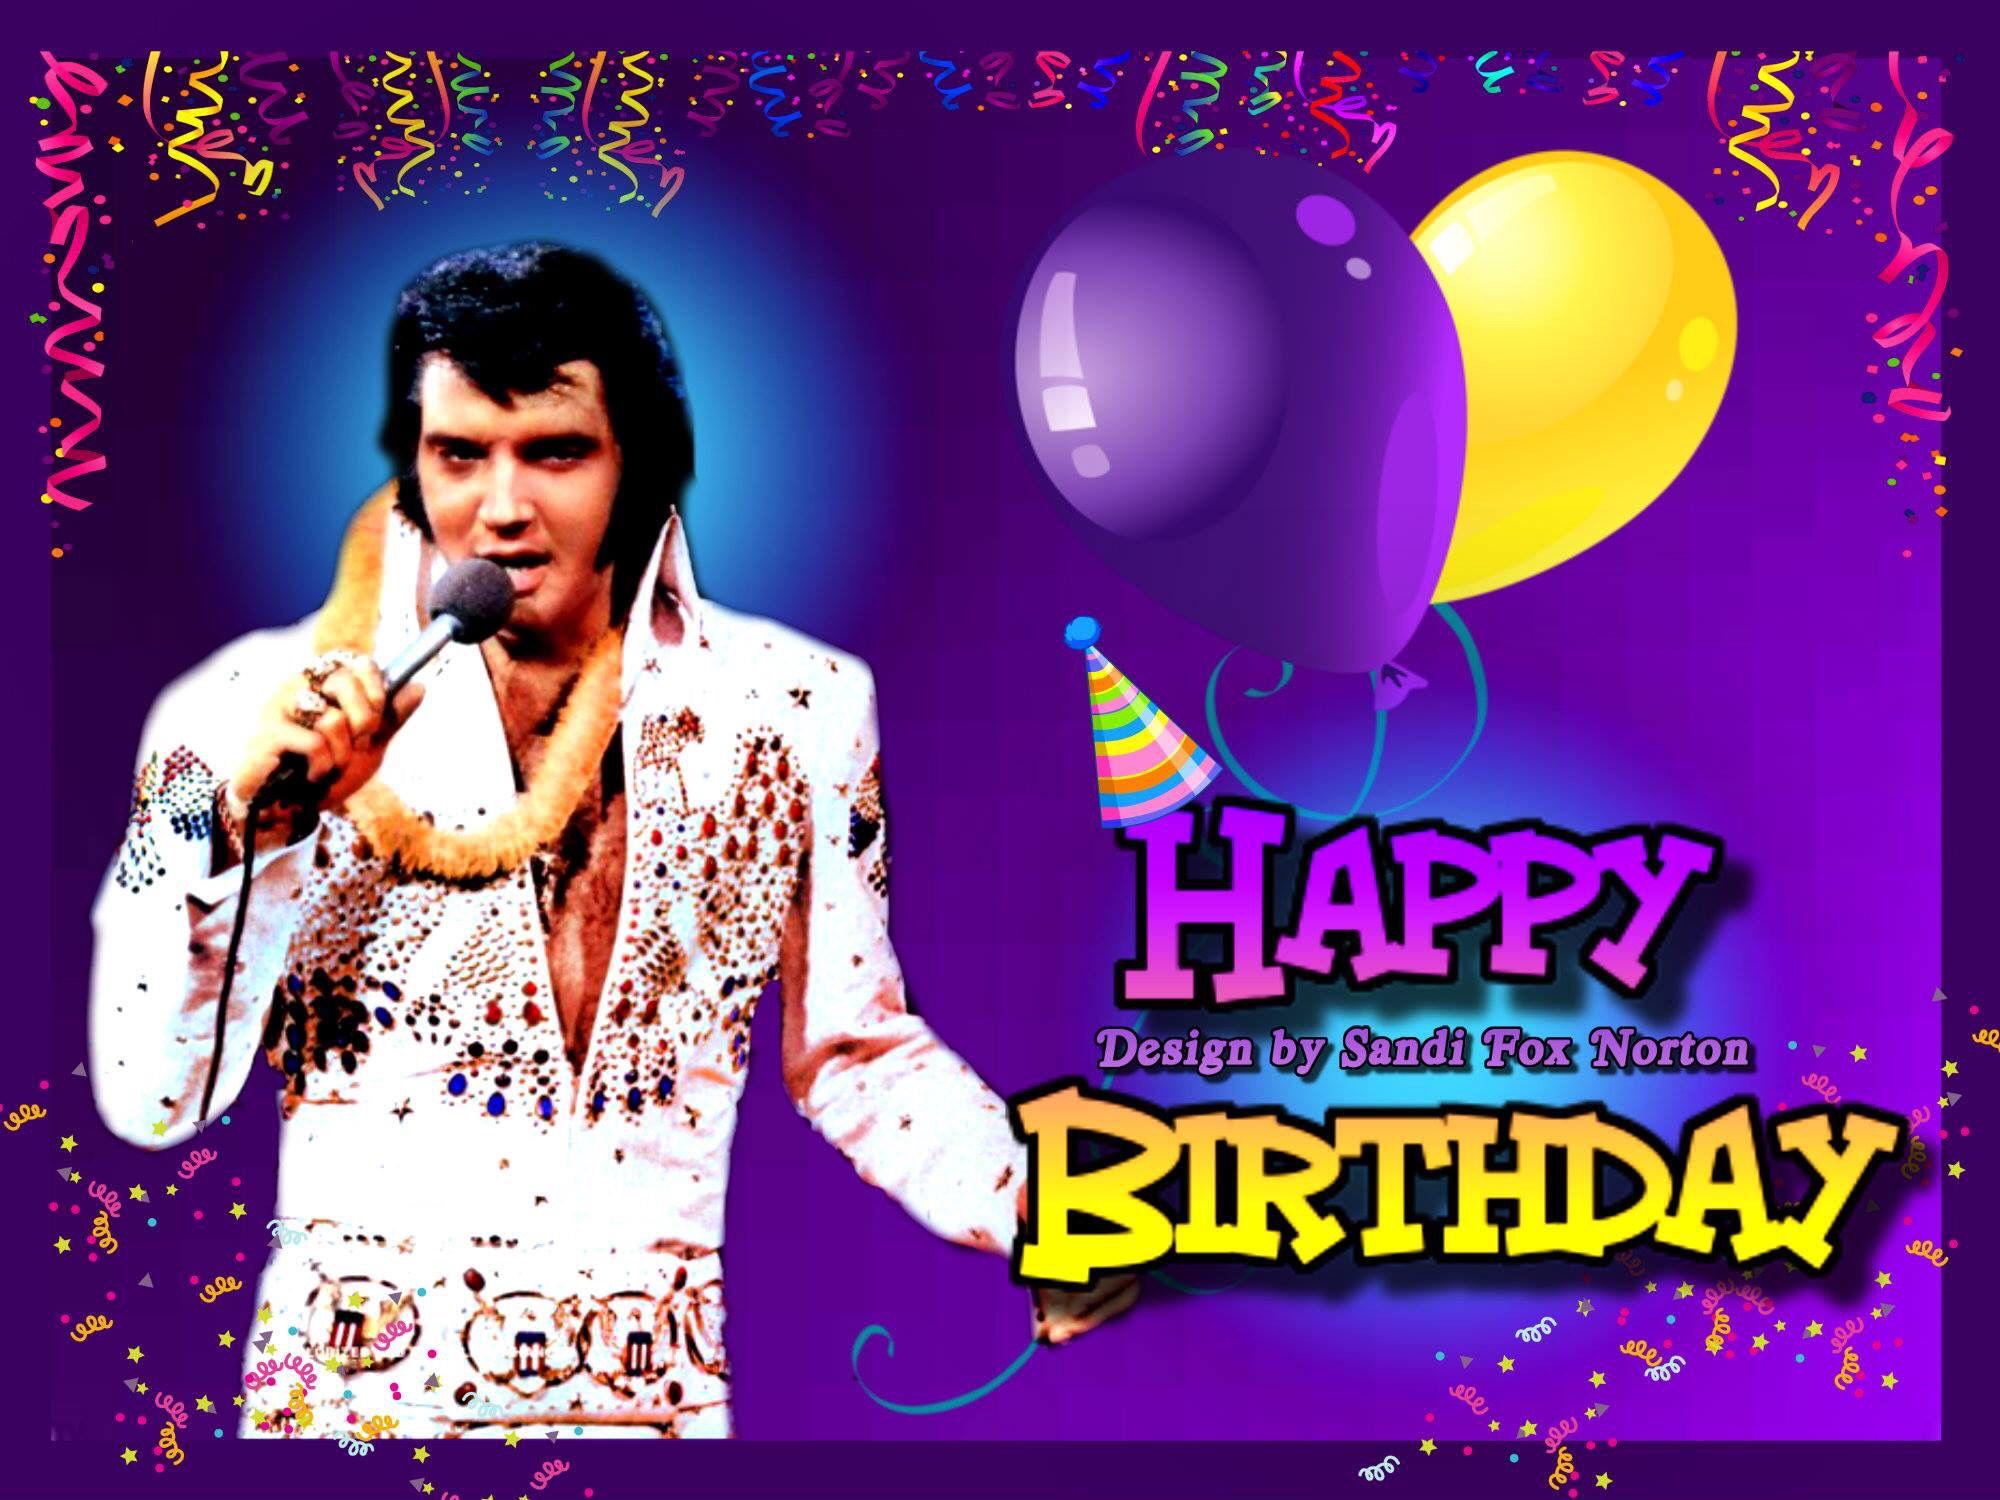 Pin By Tammy Hosey On Elvis Presley Pinterest Elvis Birthday And